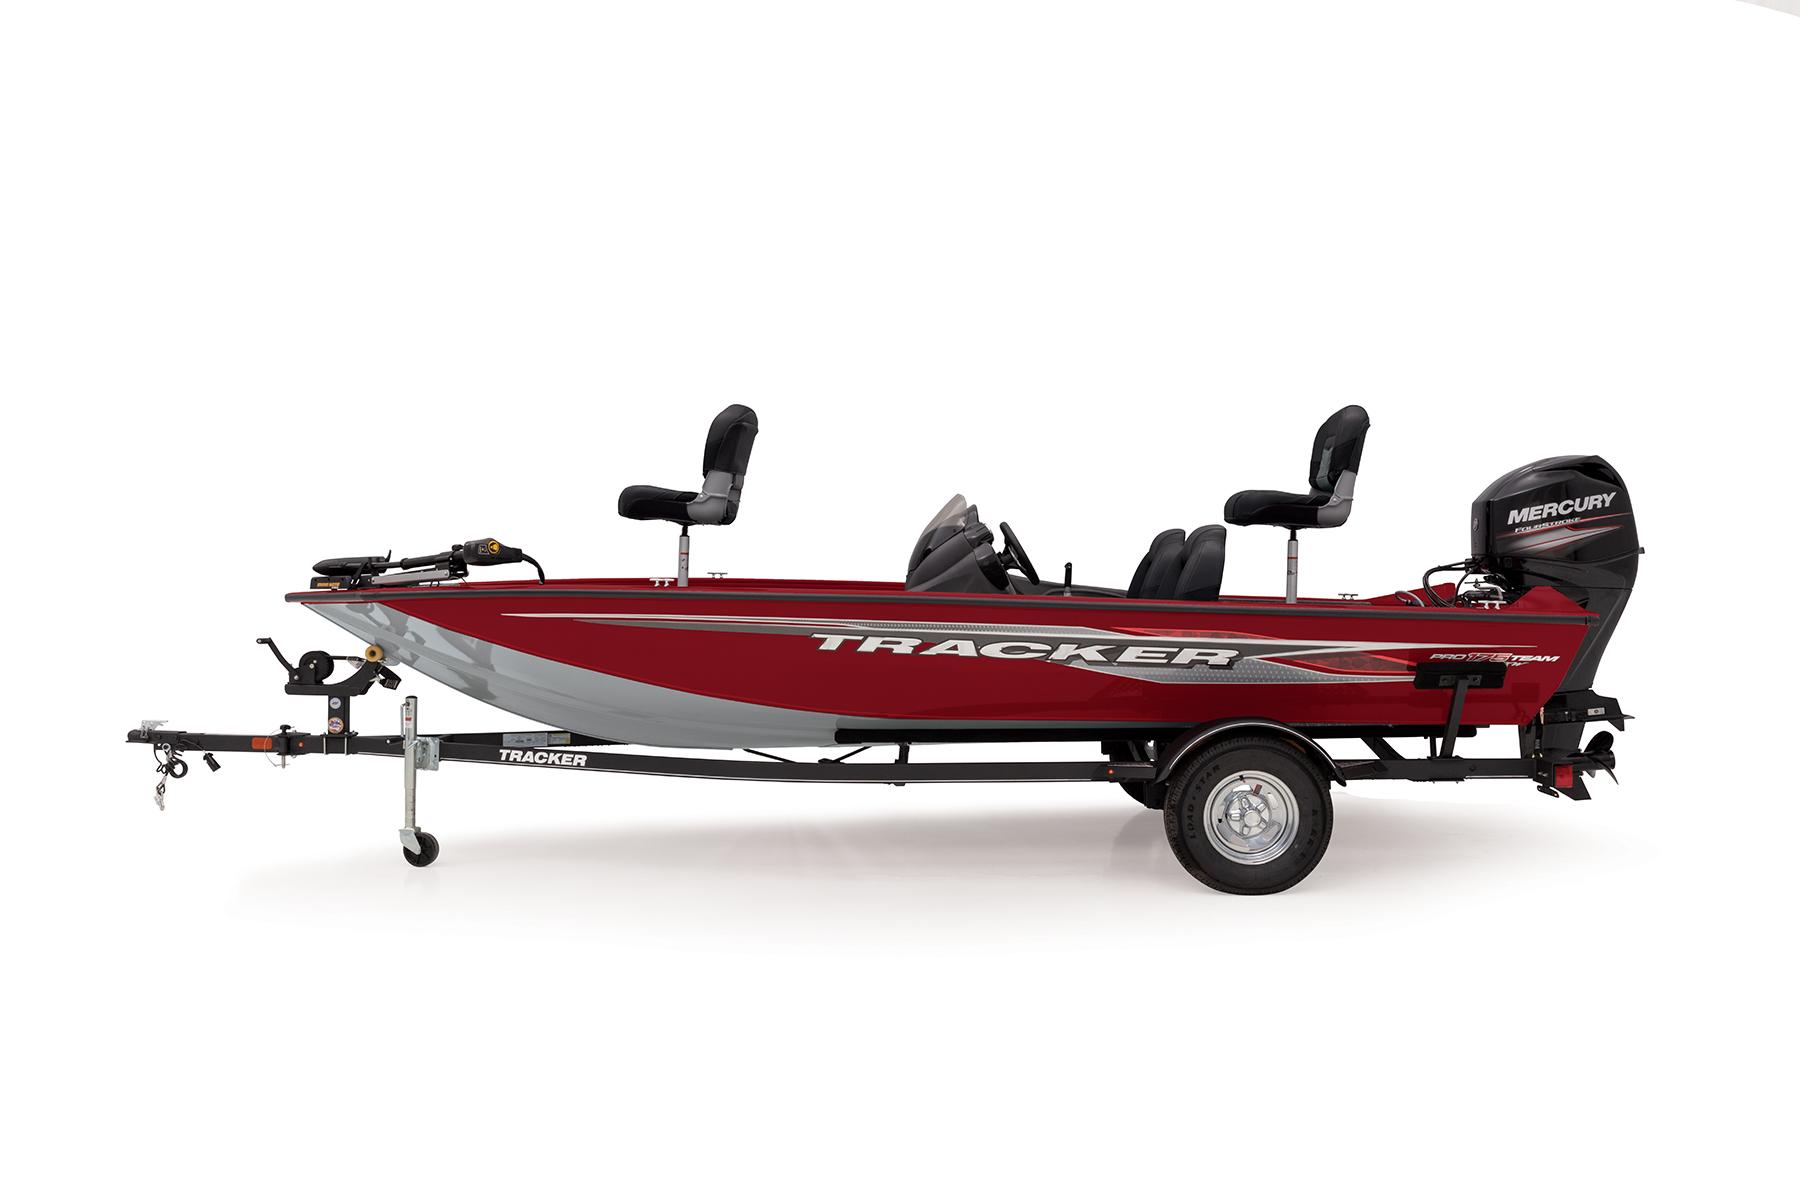 2019 PRO TEAM 175 TXW - TRACKER Mod V Bass Boat | Bass Tracker Boat Electrical Wiring Diagram |  | Tracker Boats